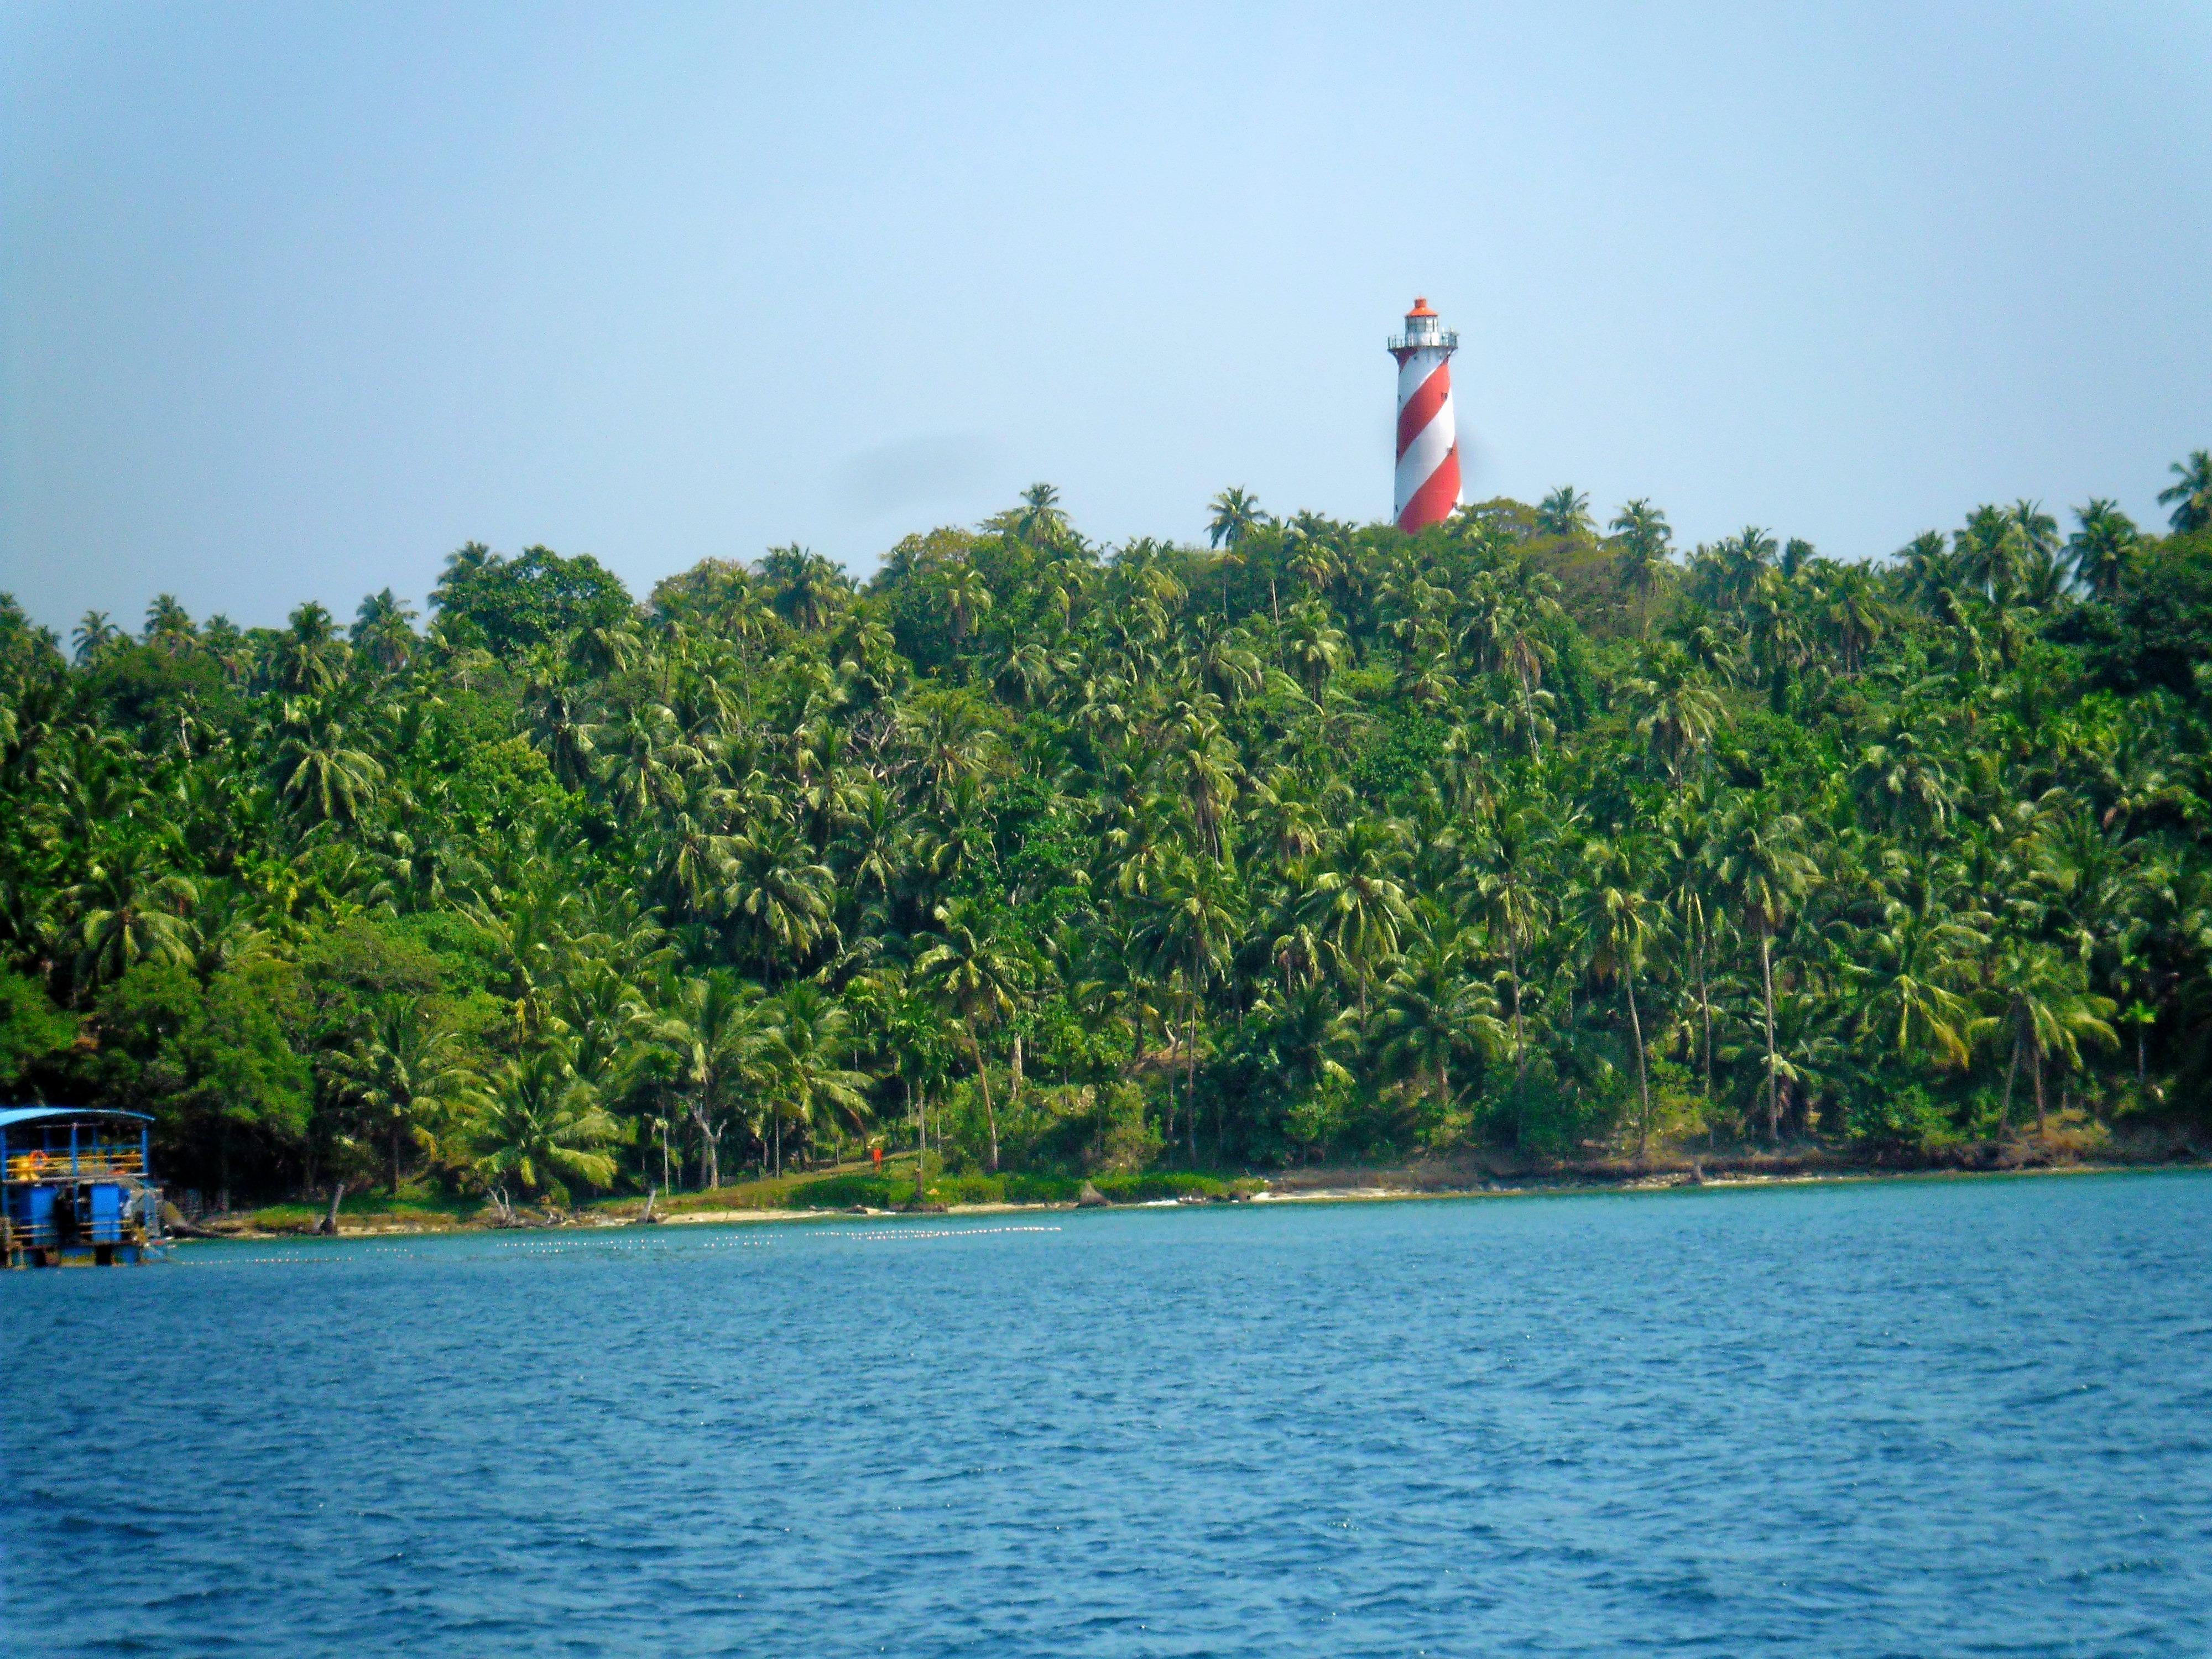 1502973700_andaman_honeymoon_north_island.jpg